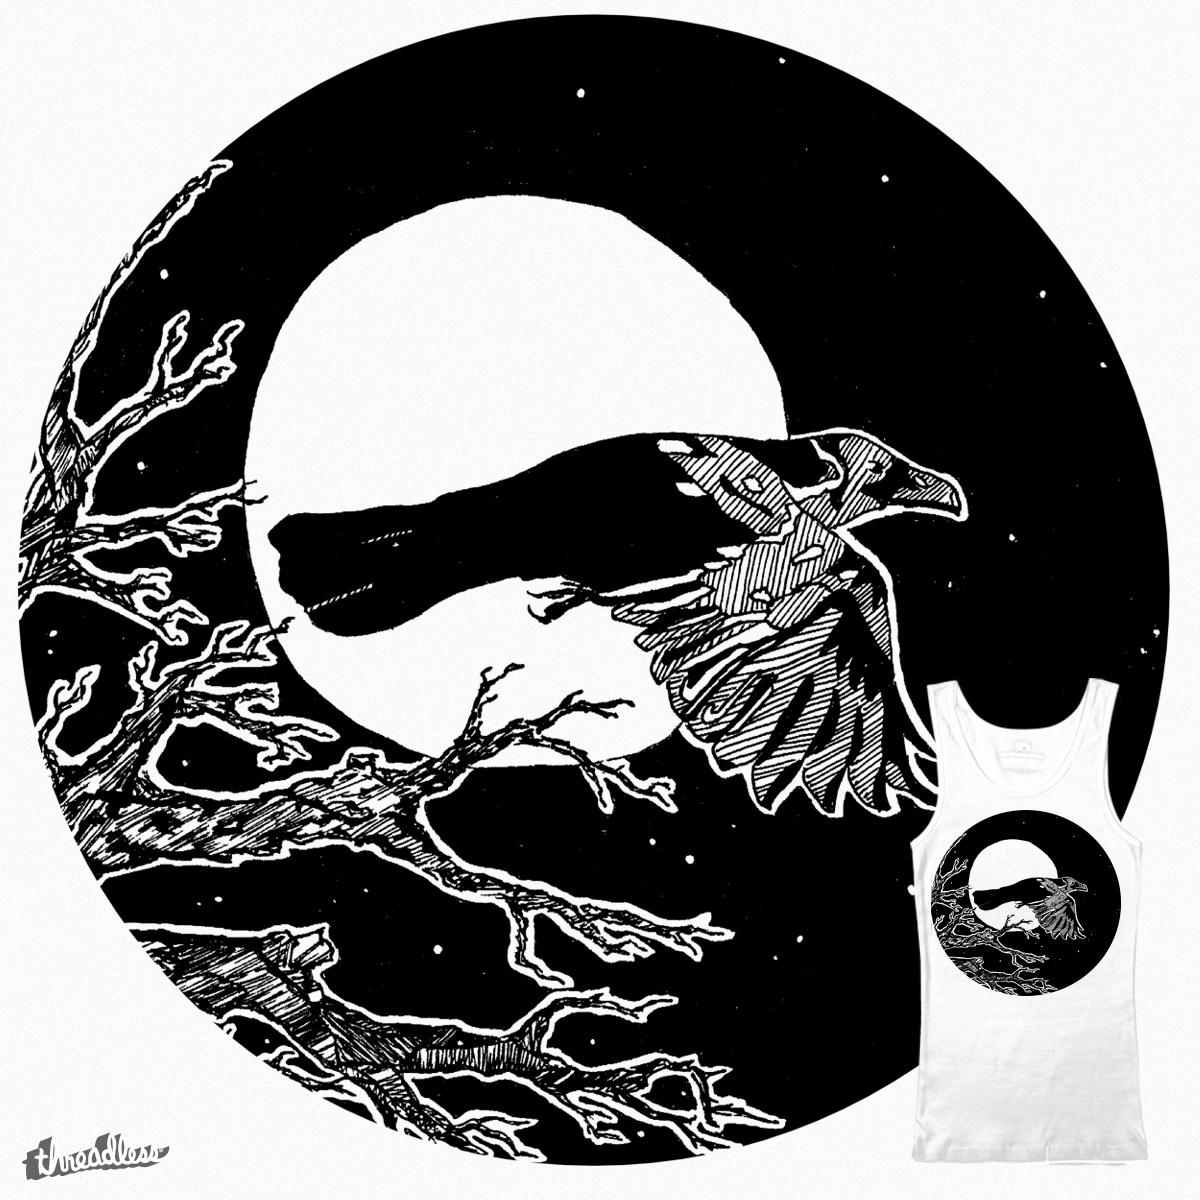 Crow by Djenne on Threadless